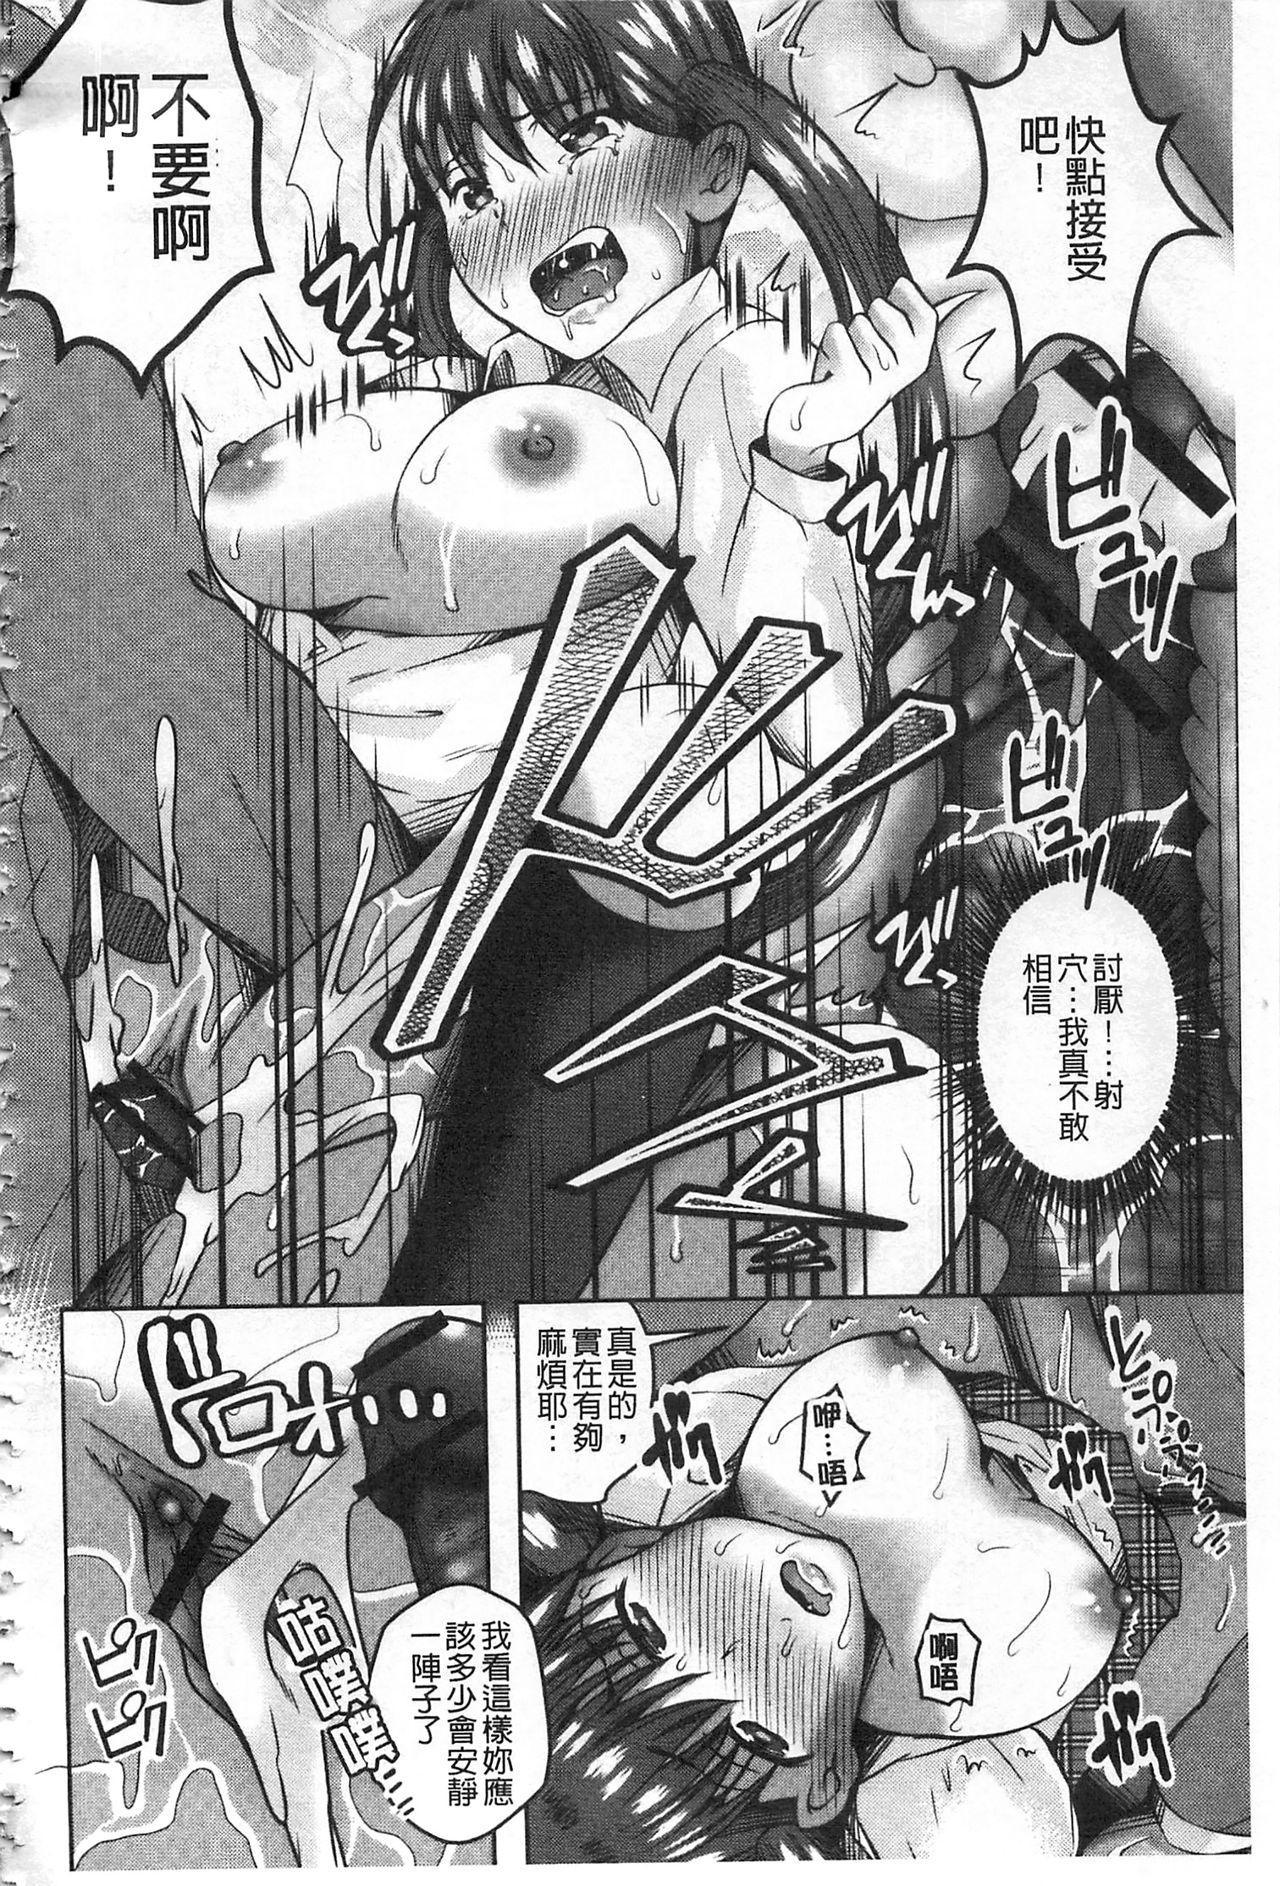 Kanjuku Otome no Odoshikata | 姦熟乙女的脅迫法 164